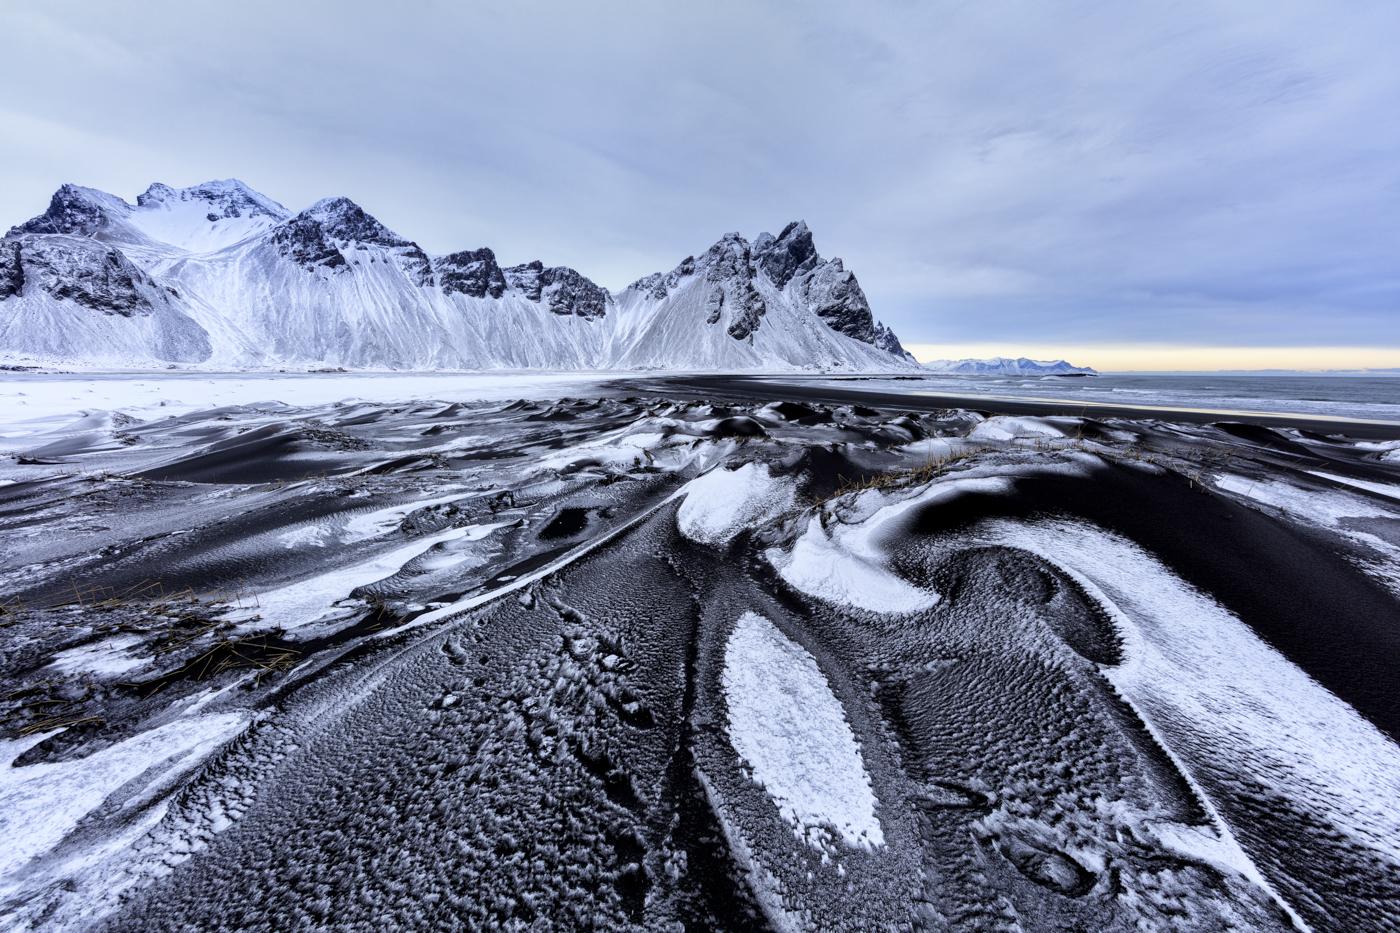 Vestrahorn, Stokksnes Peninsula, Iceland. Canon 5Ds, Canon 14mm f/2.8L, ISO 100, 1/15 sec at f/11, Tripod, © Mark Bauer